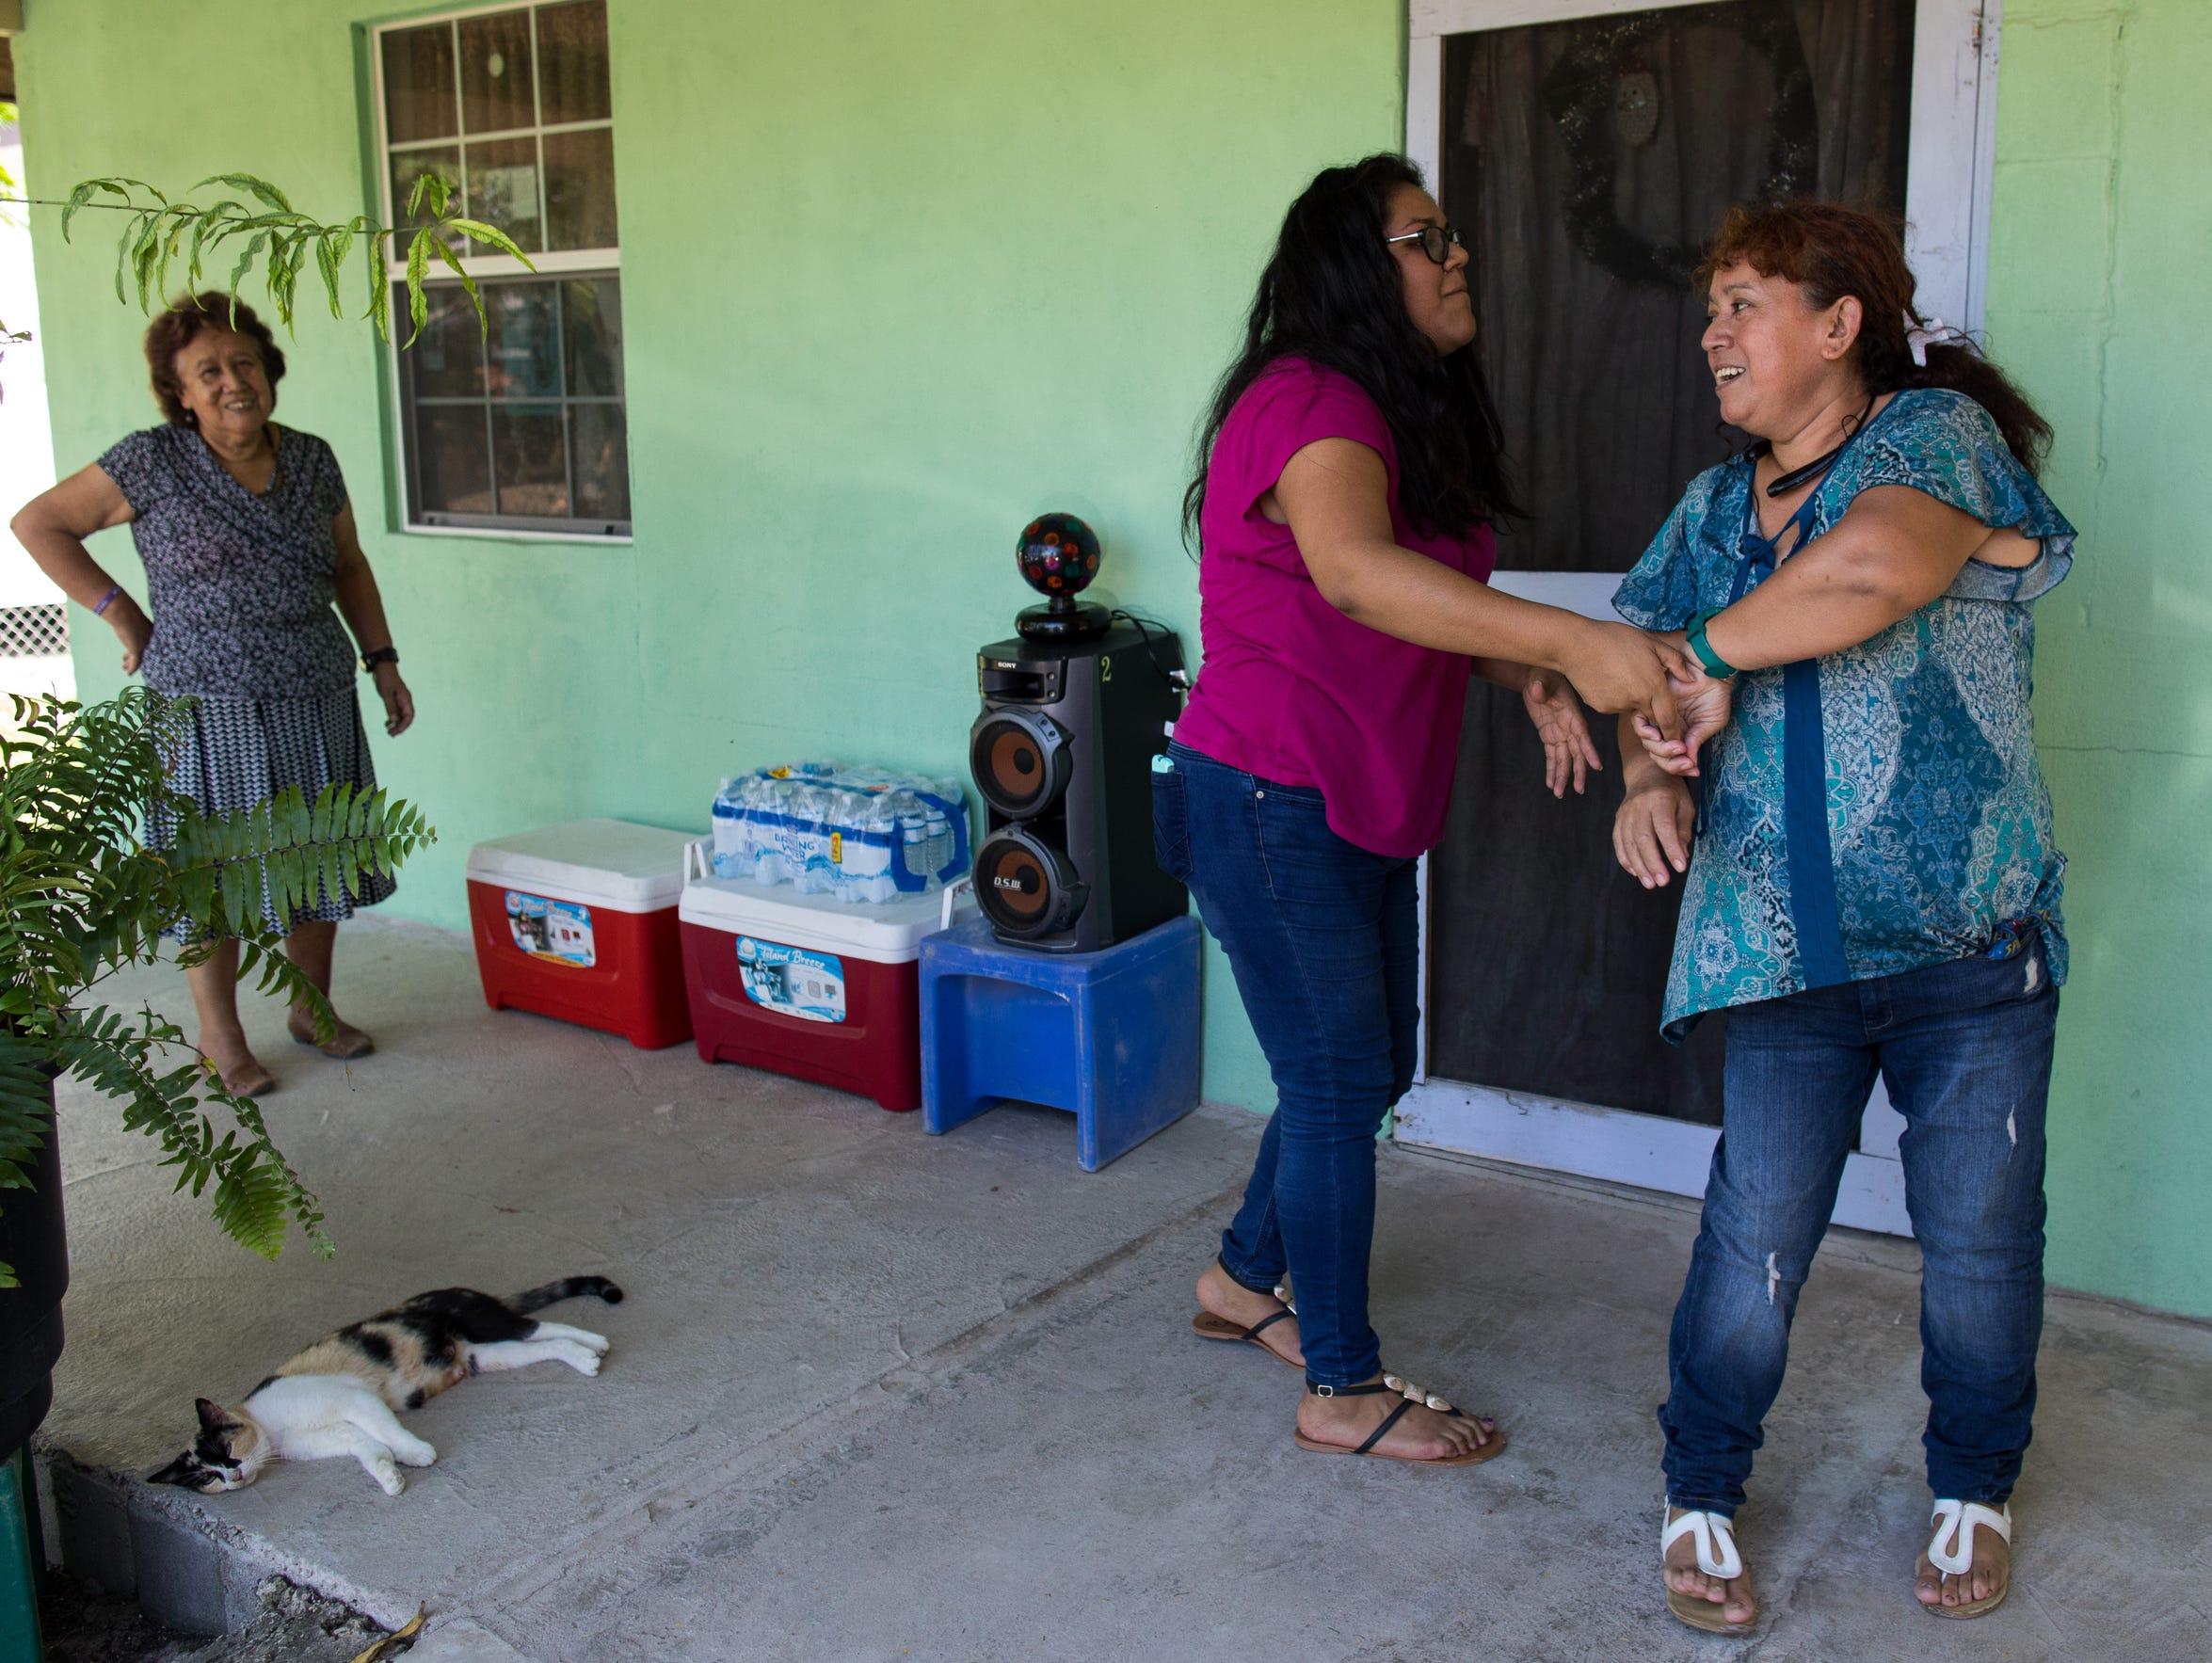 Maria Hernandez dances with her mother Carlota Palomo